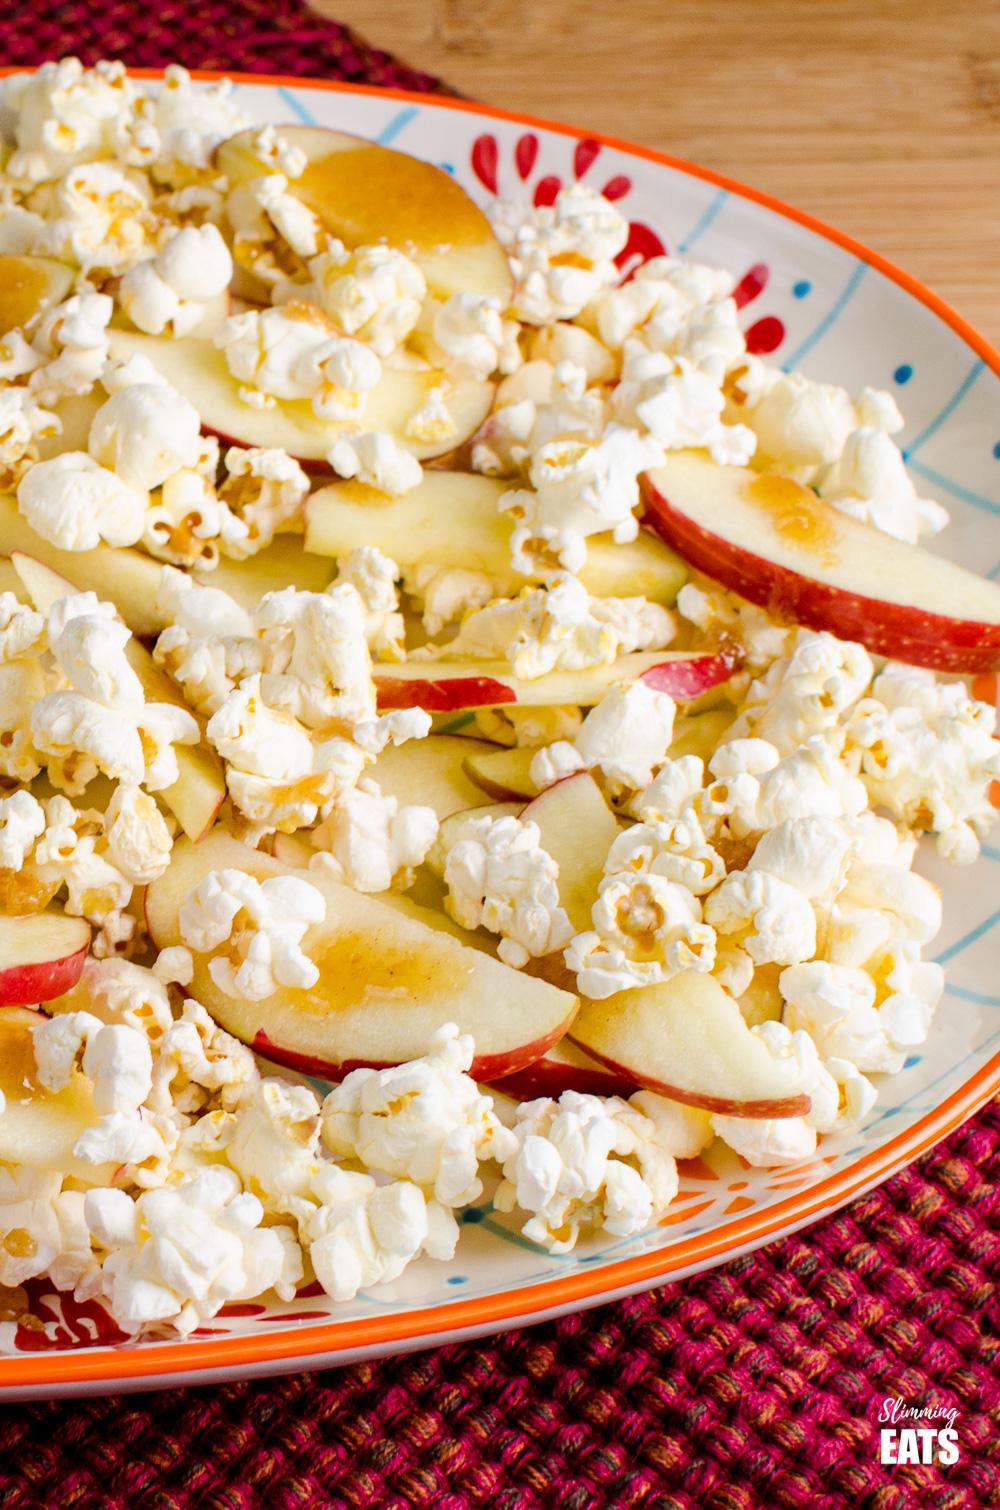 close up of caramel apple popcorn nachos on patterned plate